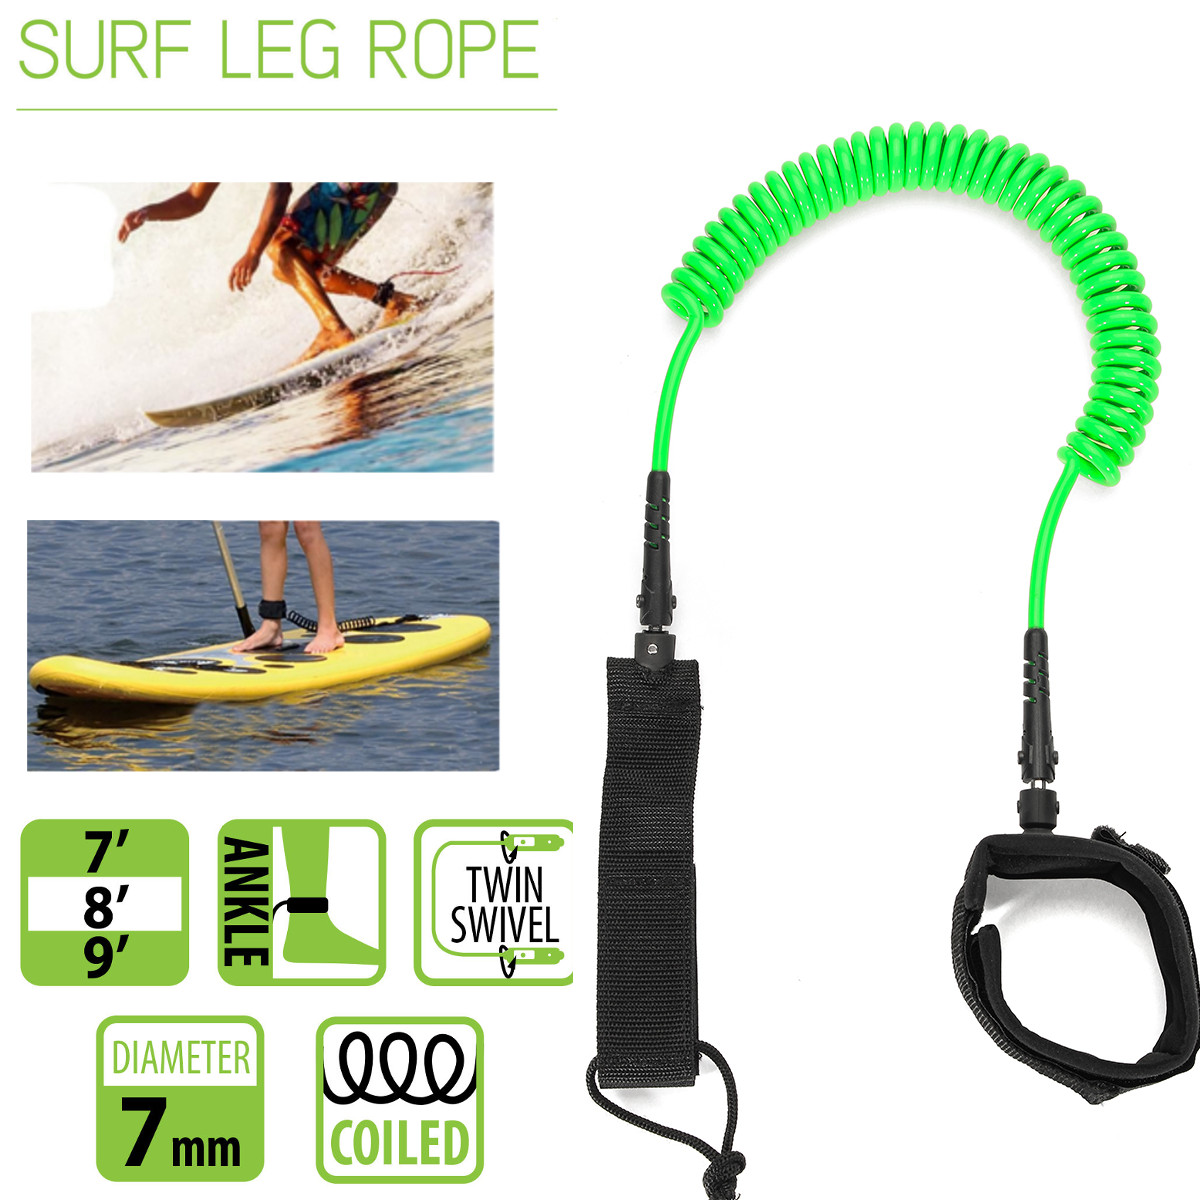 10ft 7mm SUP tobillo Correa tabla de surf en espiral Stand UP Paddle Board TPU paddle board cuerda surf accesorio